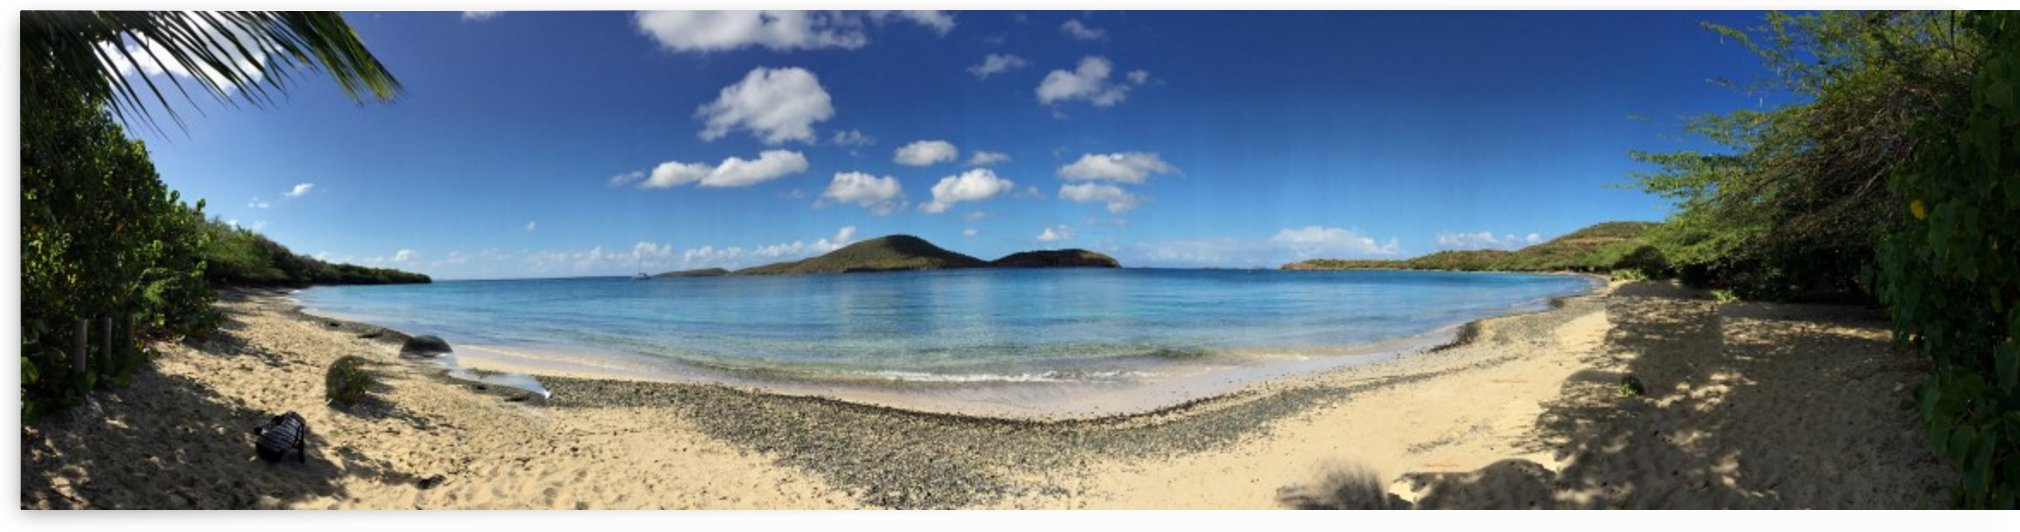 Zoni Beach  Puerto Rico by On da Raks